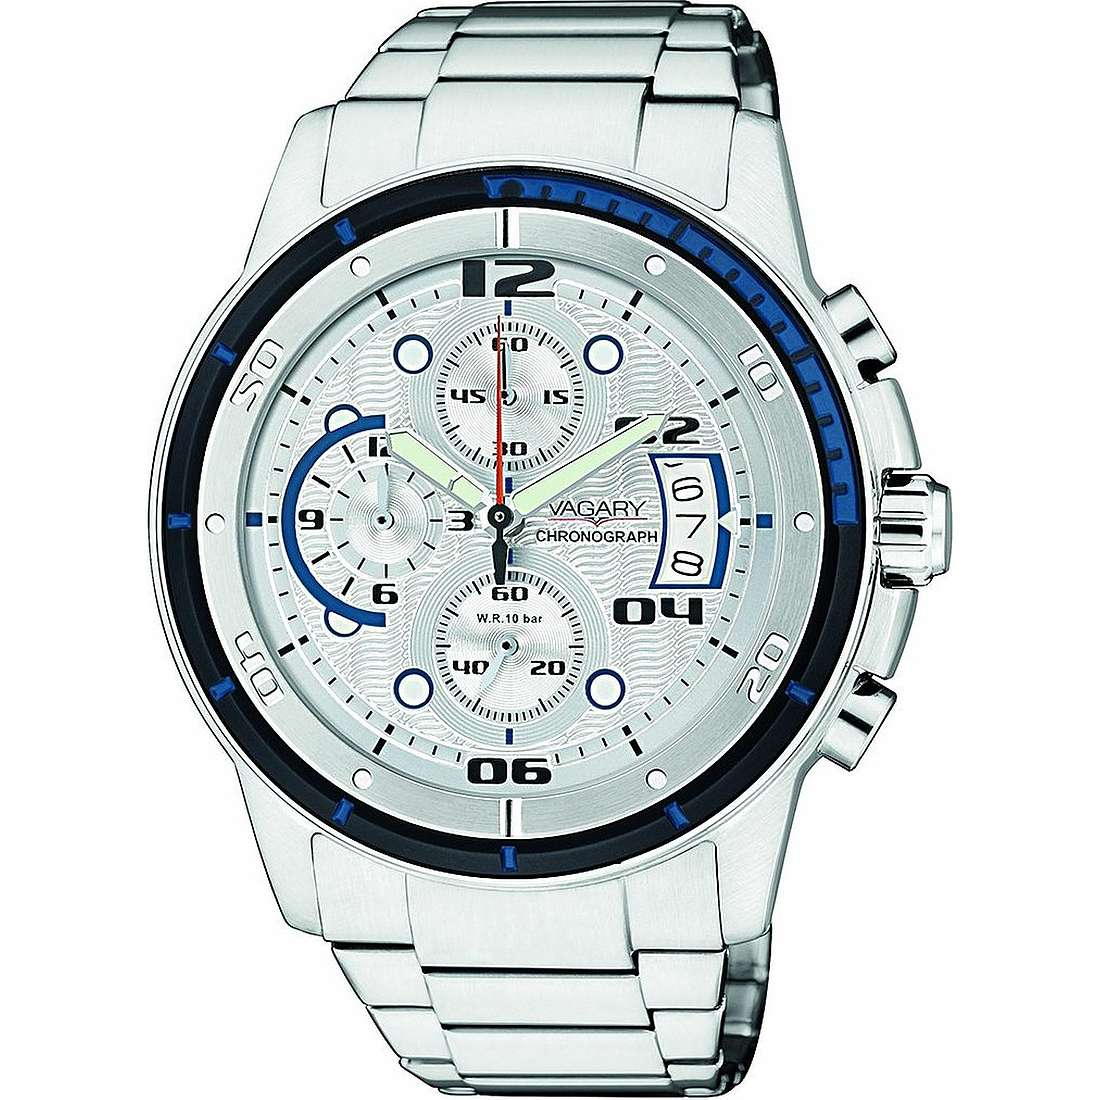 montre chronographe homme Vagary By Citizen IA8-211-11